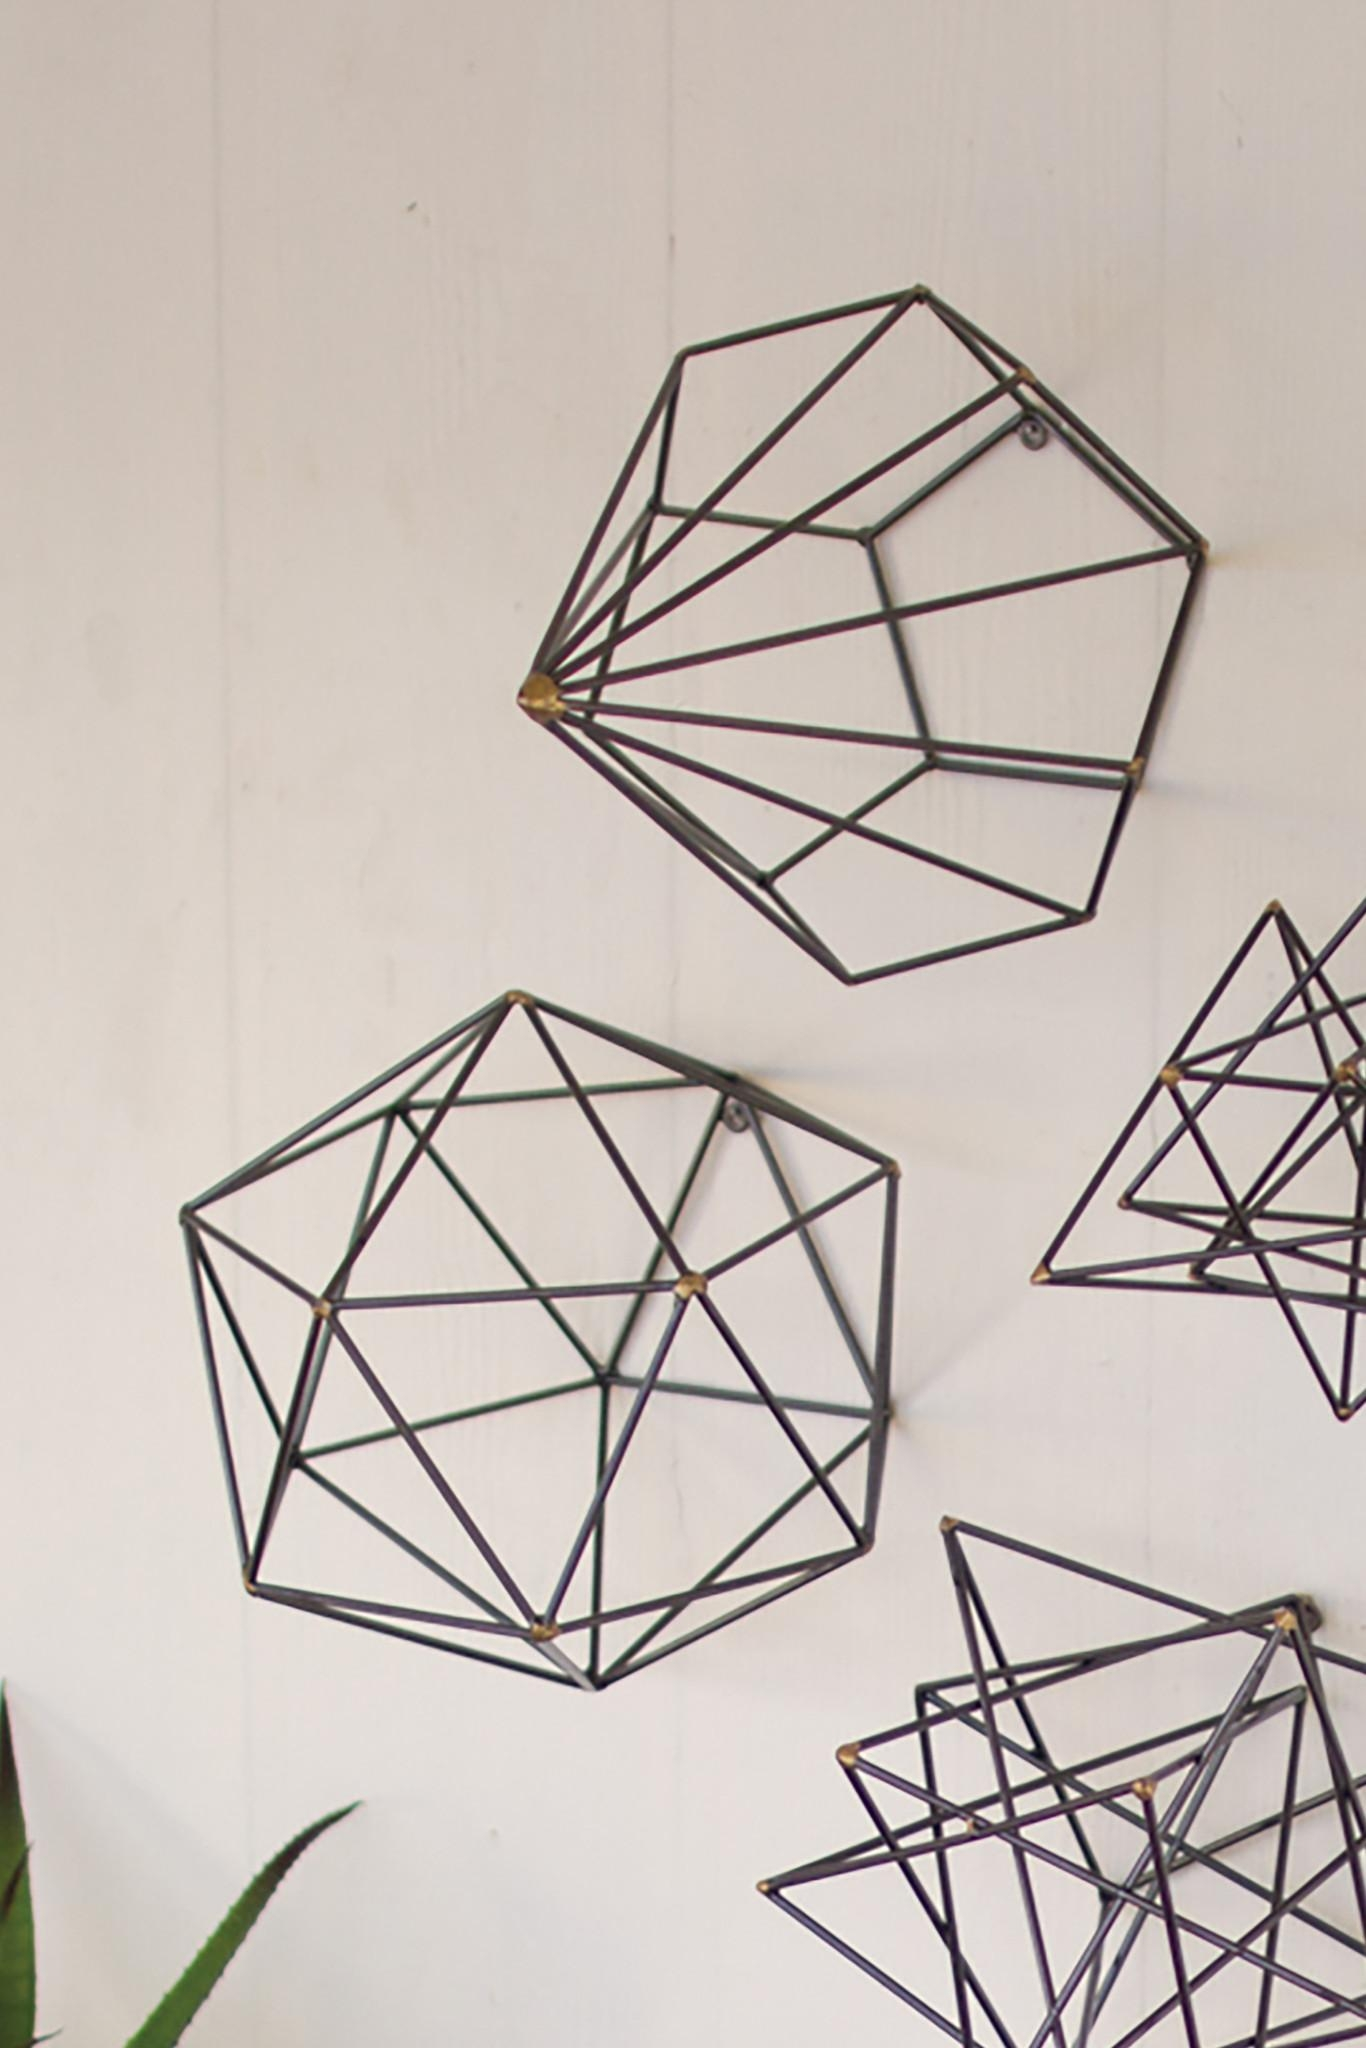 Geometric Metal Wall Art Elegant Diy Wall Art For Oversized Wall Intended For Oversized Metal Wall Art (Image 8 of 23)